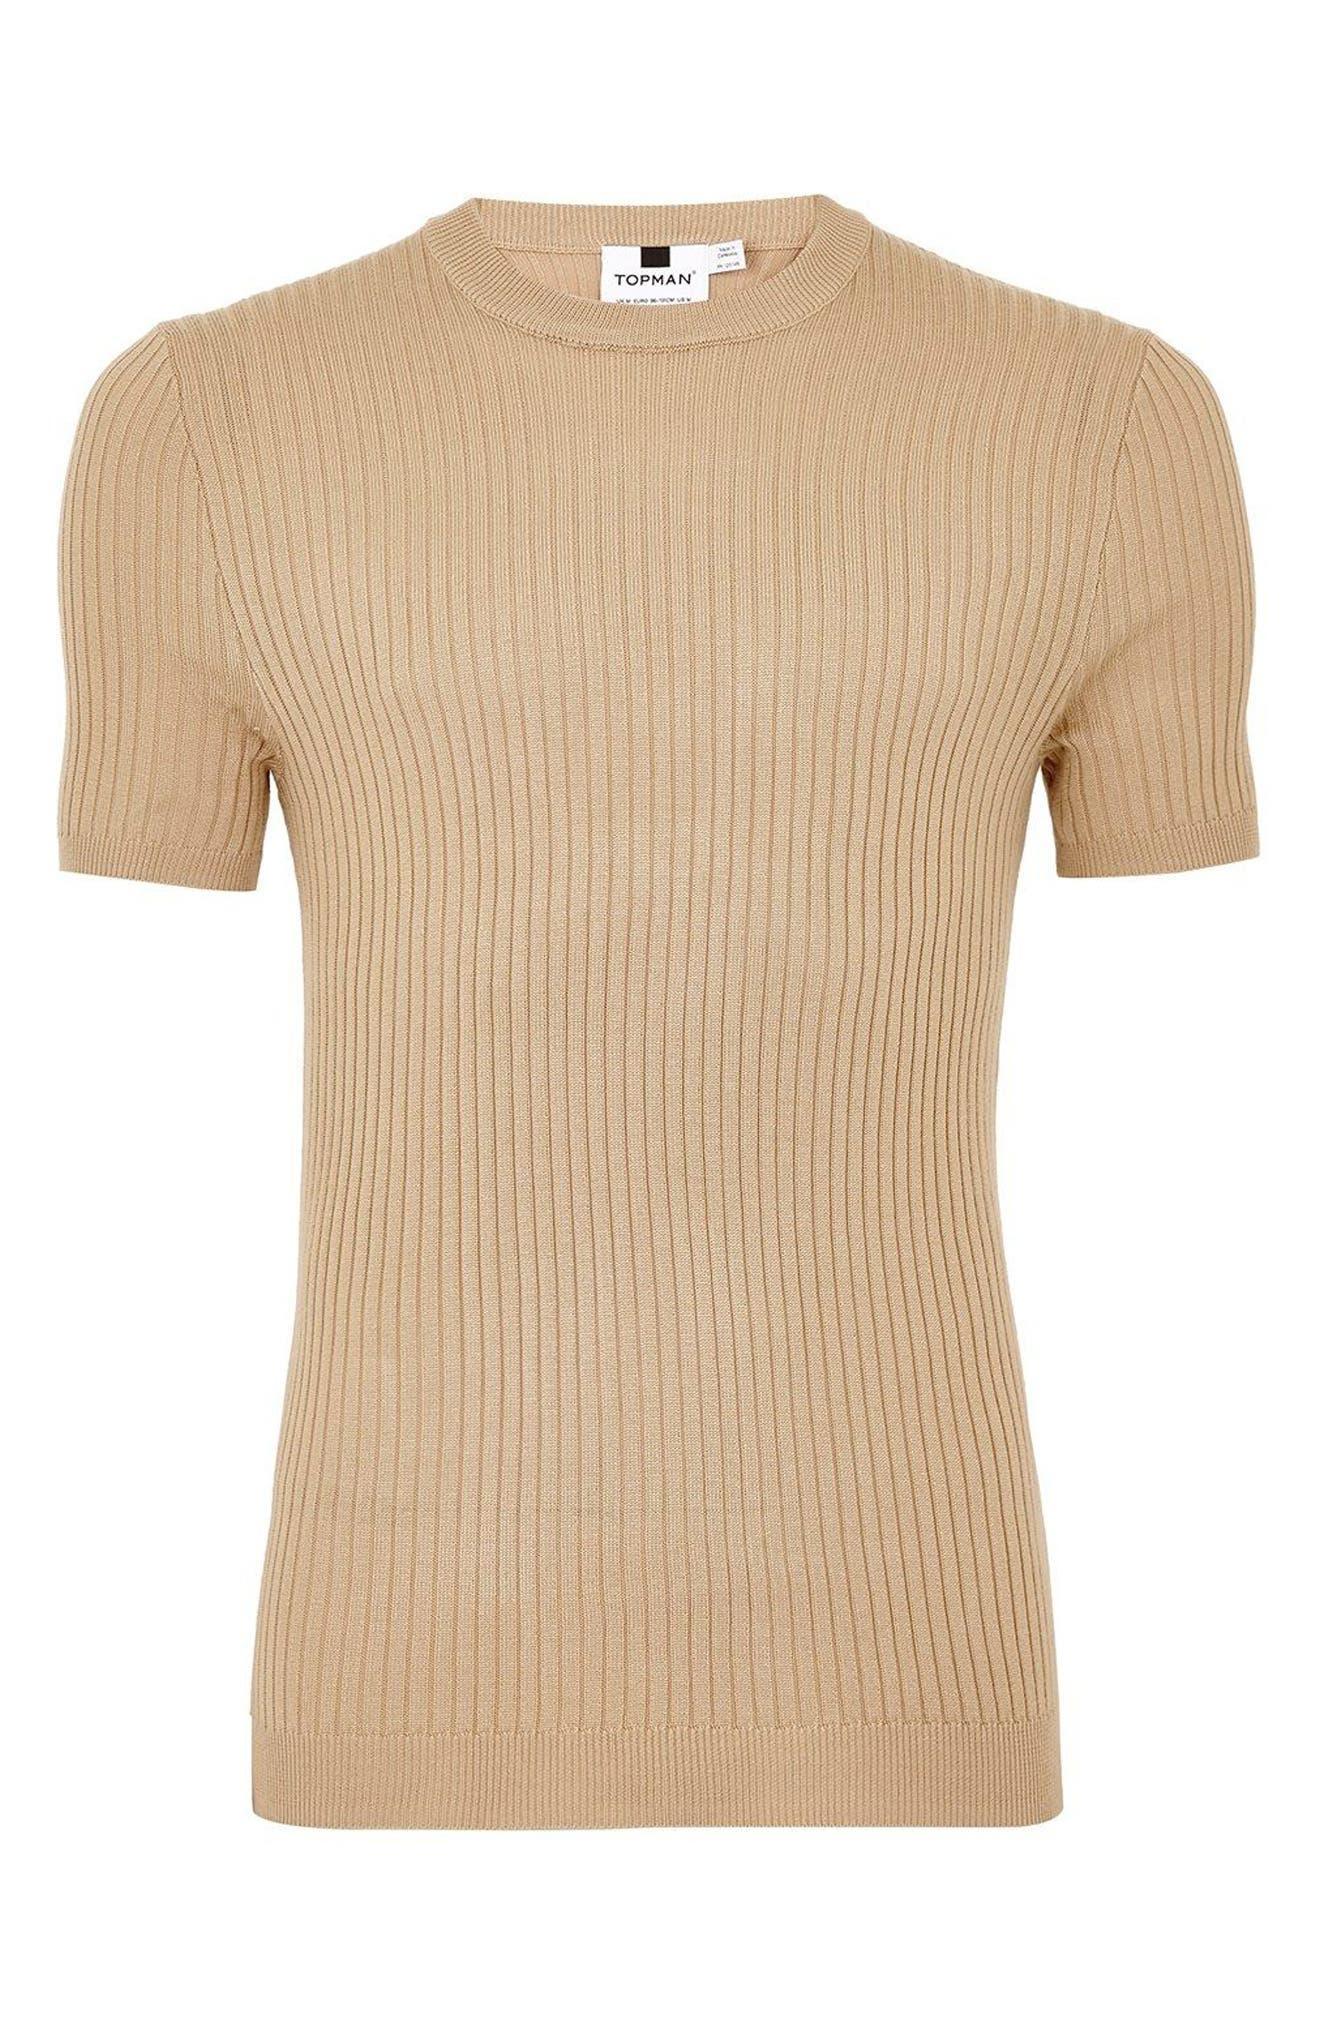 TOPMAN,                             Short Sleeve Muscle Fit Shirt,                             Alternate thumbnail 4, color,                             250